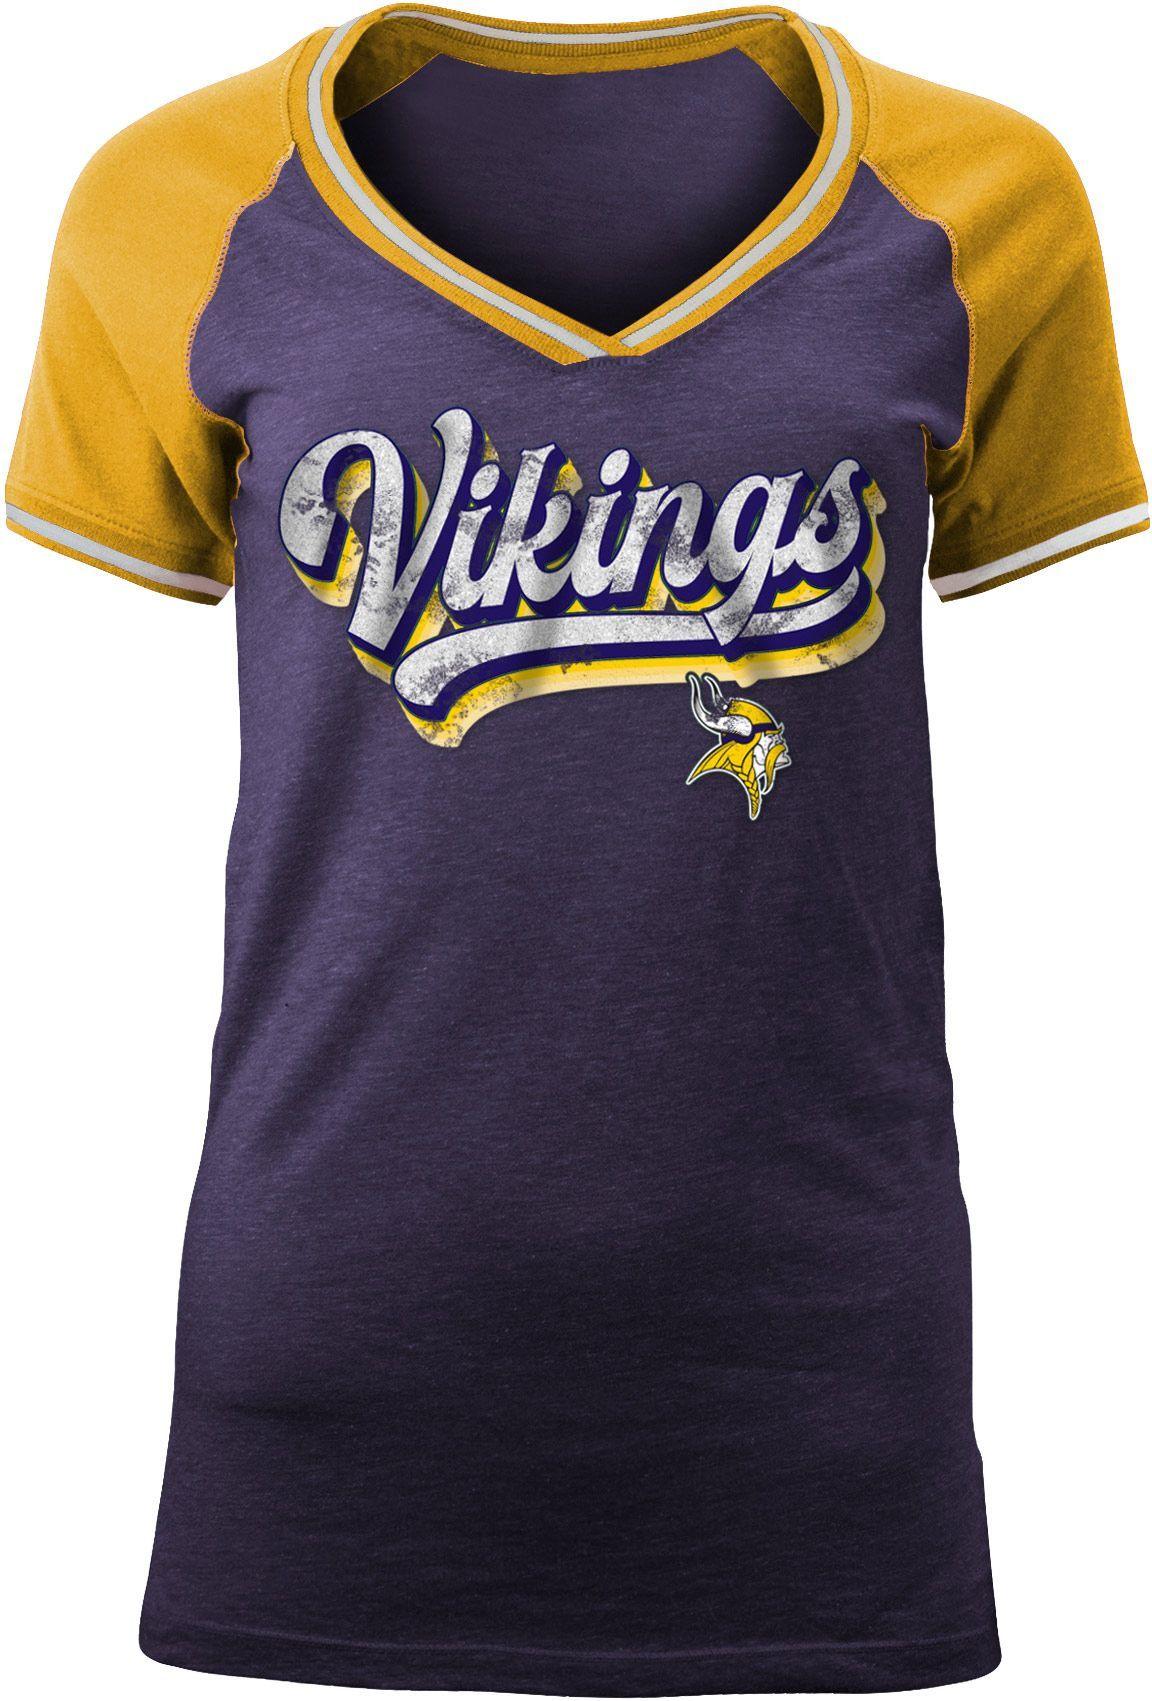 quality design 8deba a336c Team Apparel Women's Minnesota Retro Glitter T-Shirt, Size ...